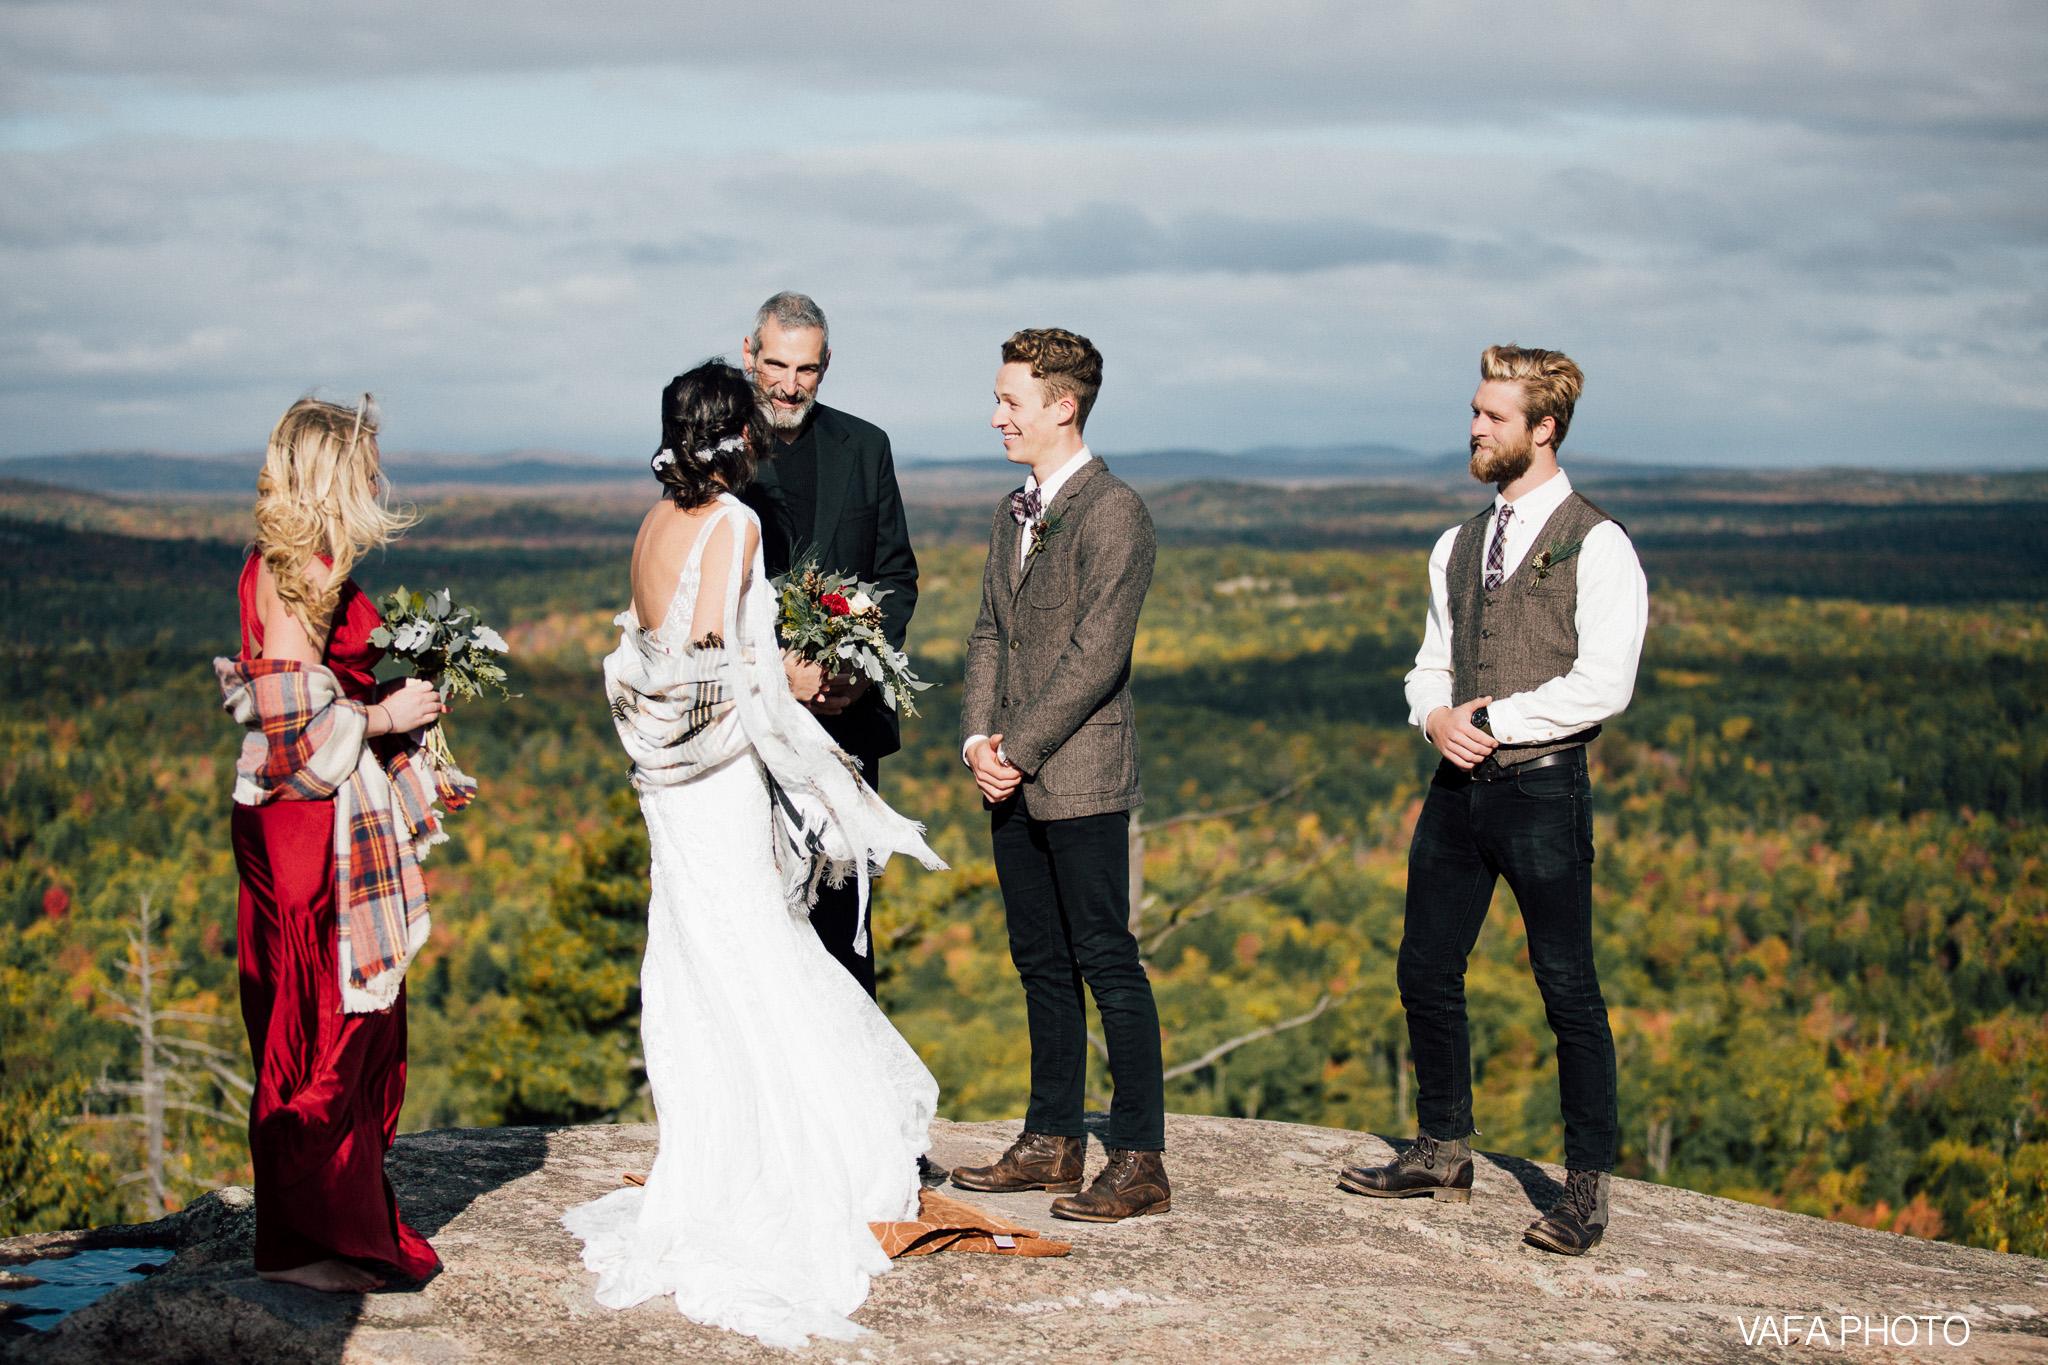 Hogback-Mountain-Wedding-Chelsea-Josh-Vafa-Photo-198.jpg